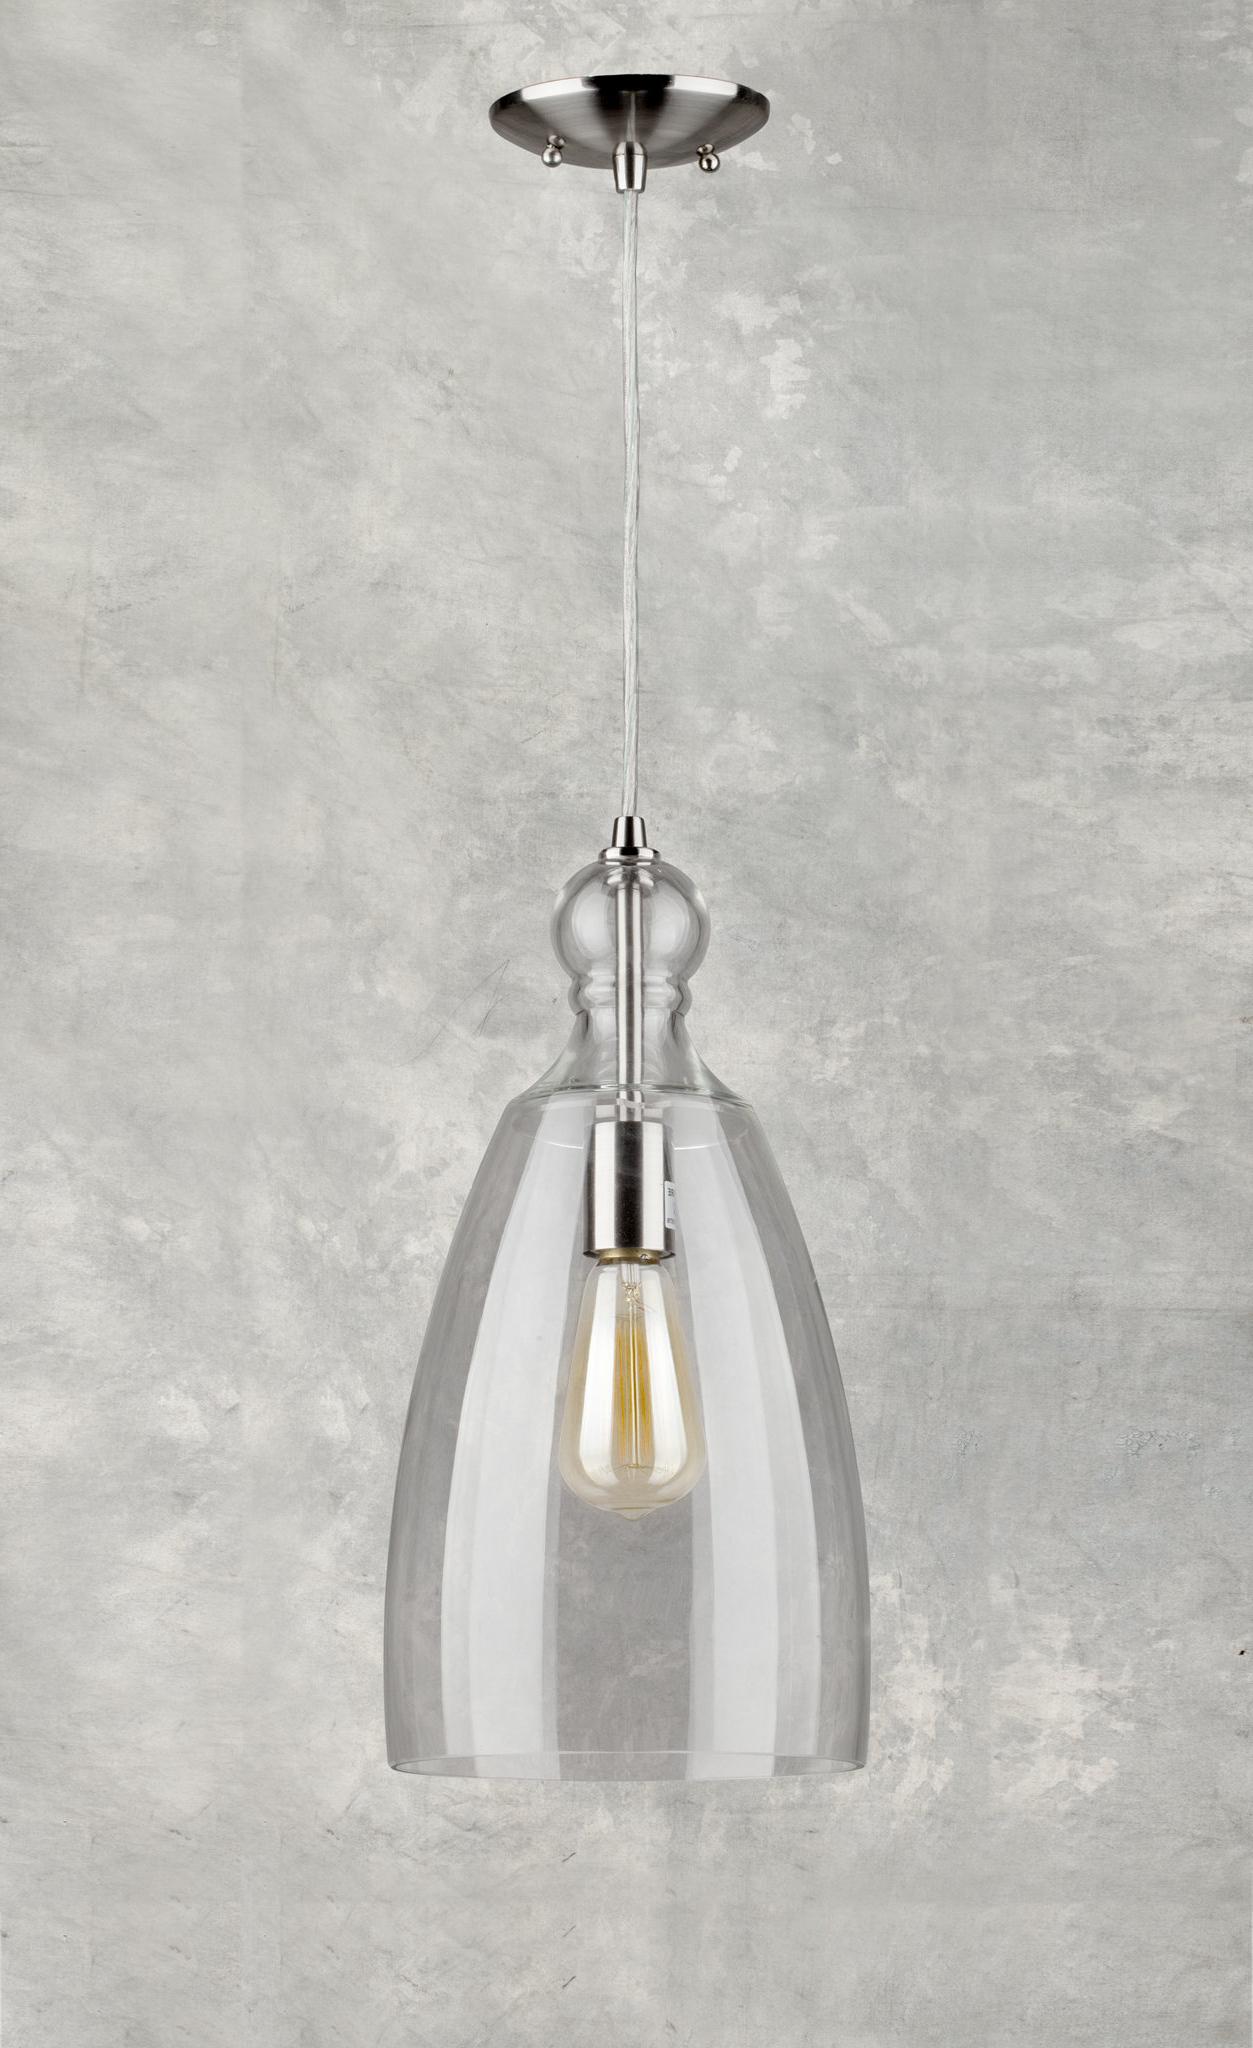 Goldie 1 Light Single Bell Pendants Intended For 2019 Du Bois Cord Hung 1 Light Bell Pendant (View 9 of 25)